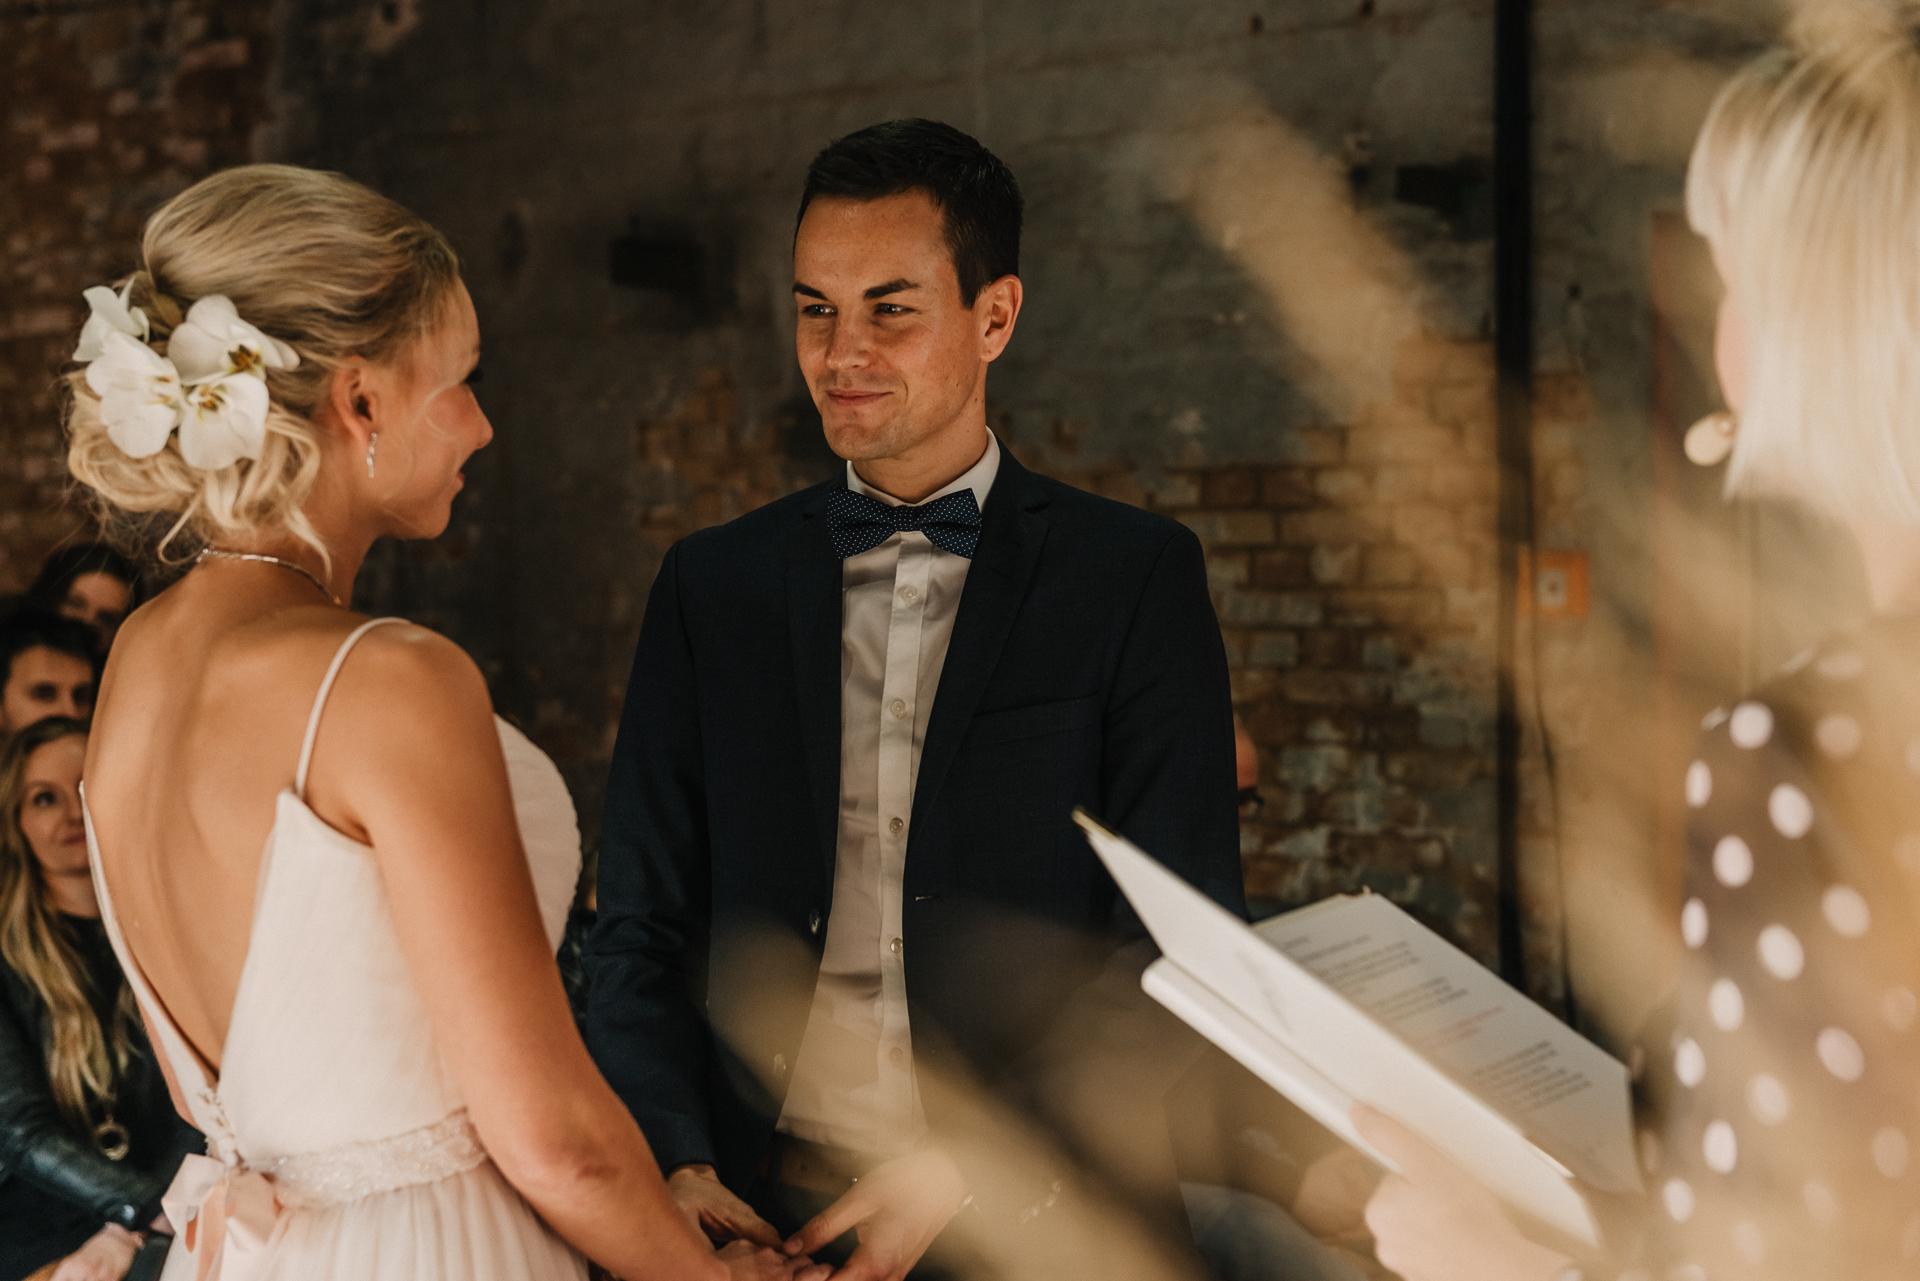 Zweinander-LeonoreHerzog-WeddingMarket-OnTour20191110-8956